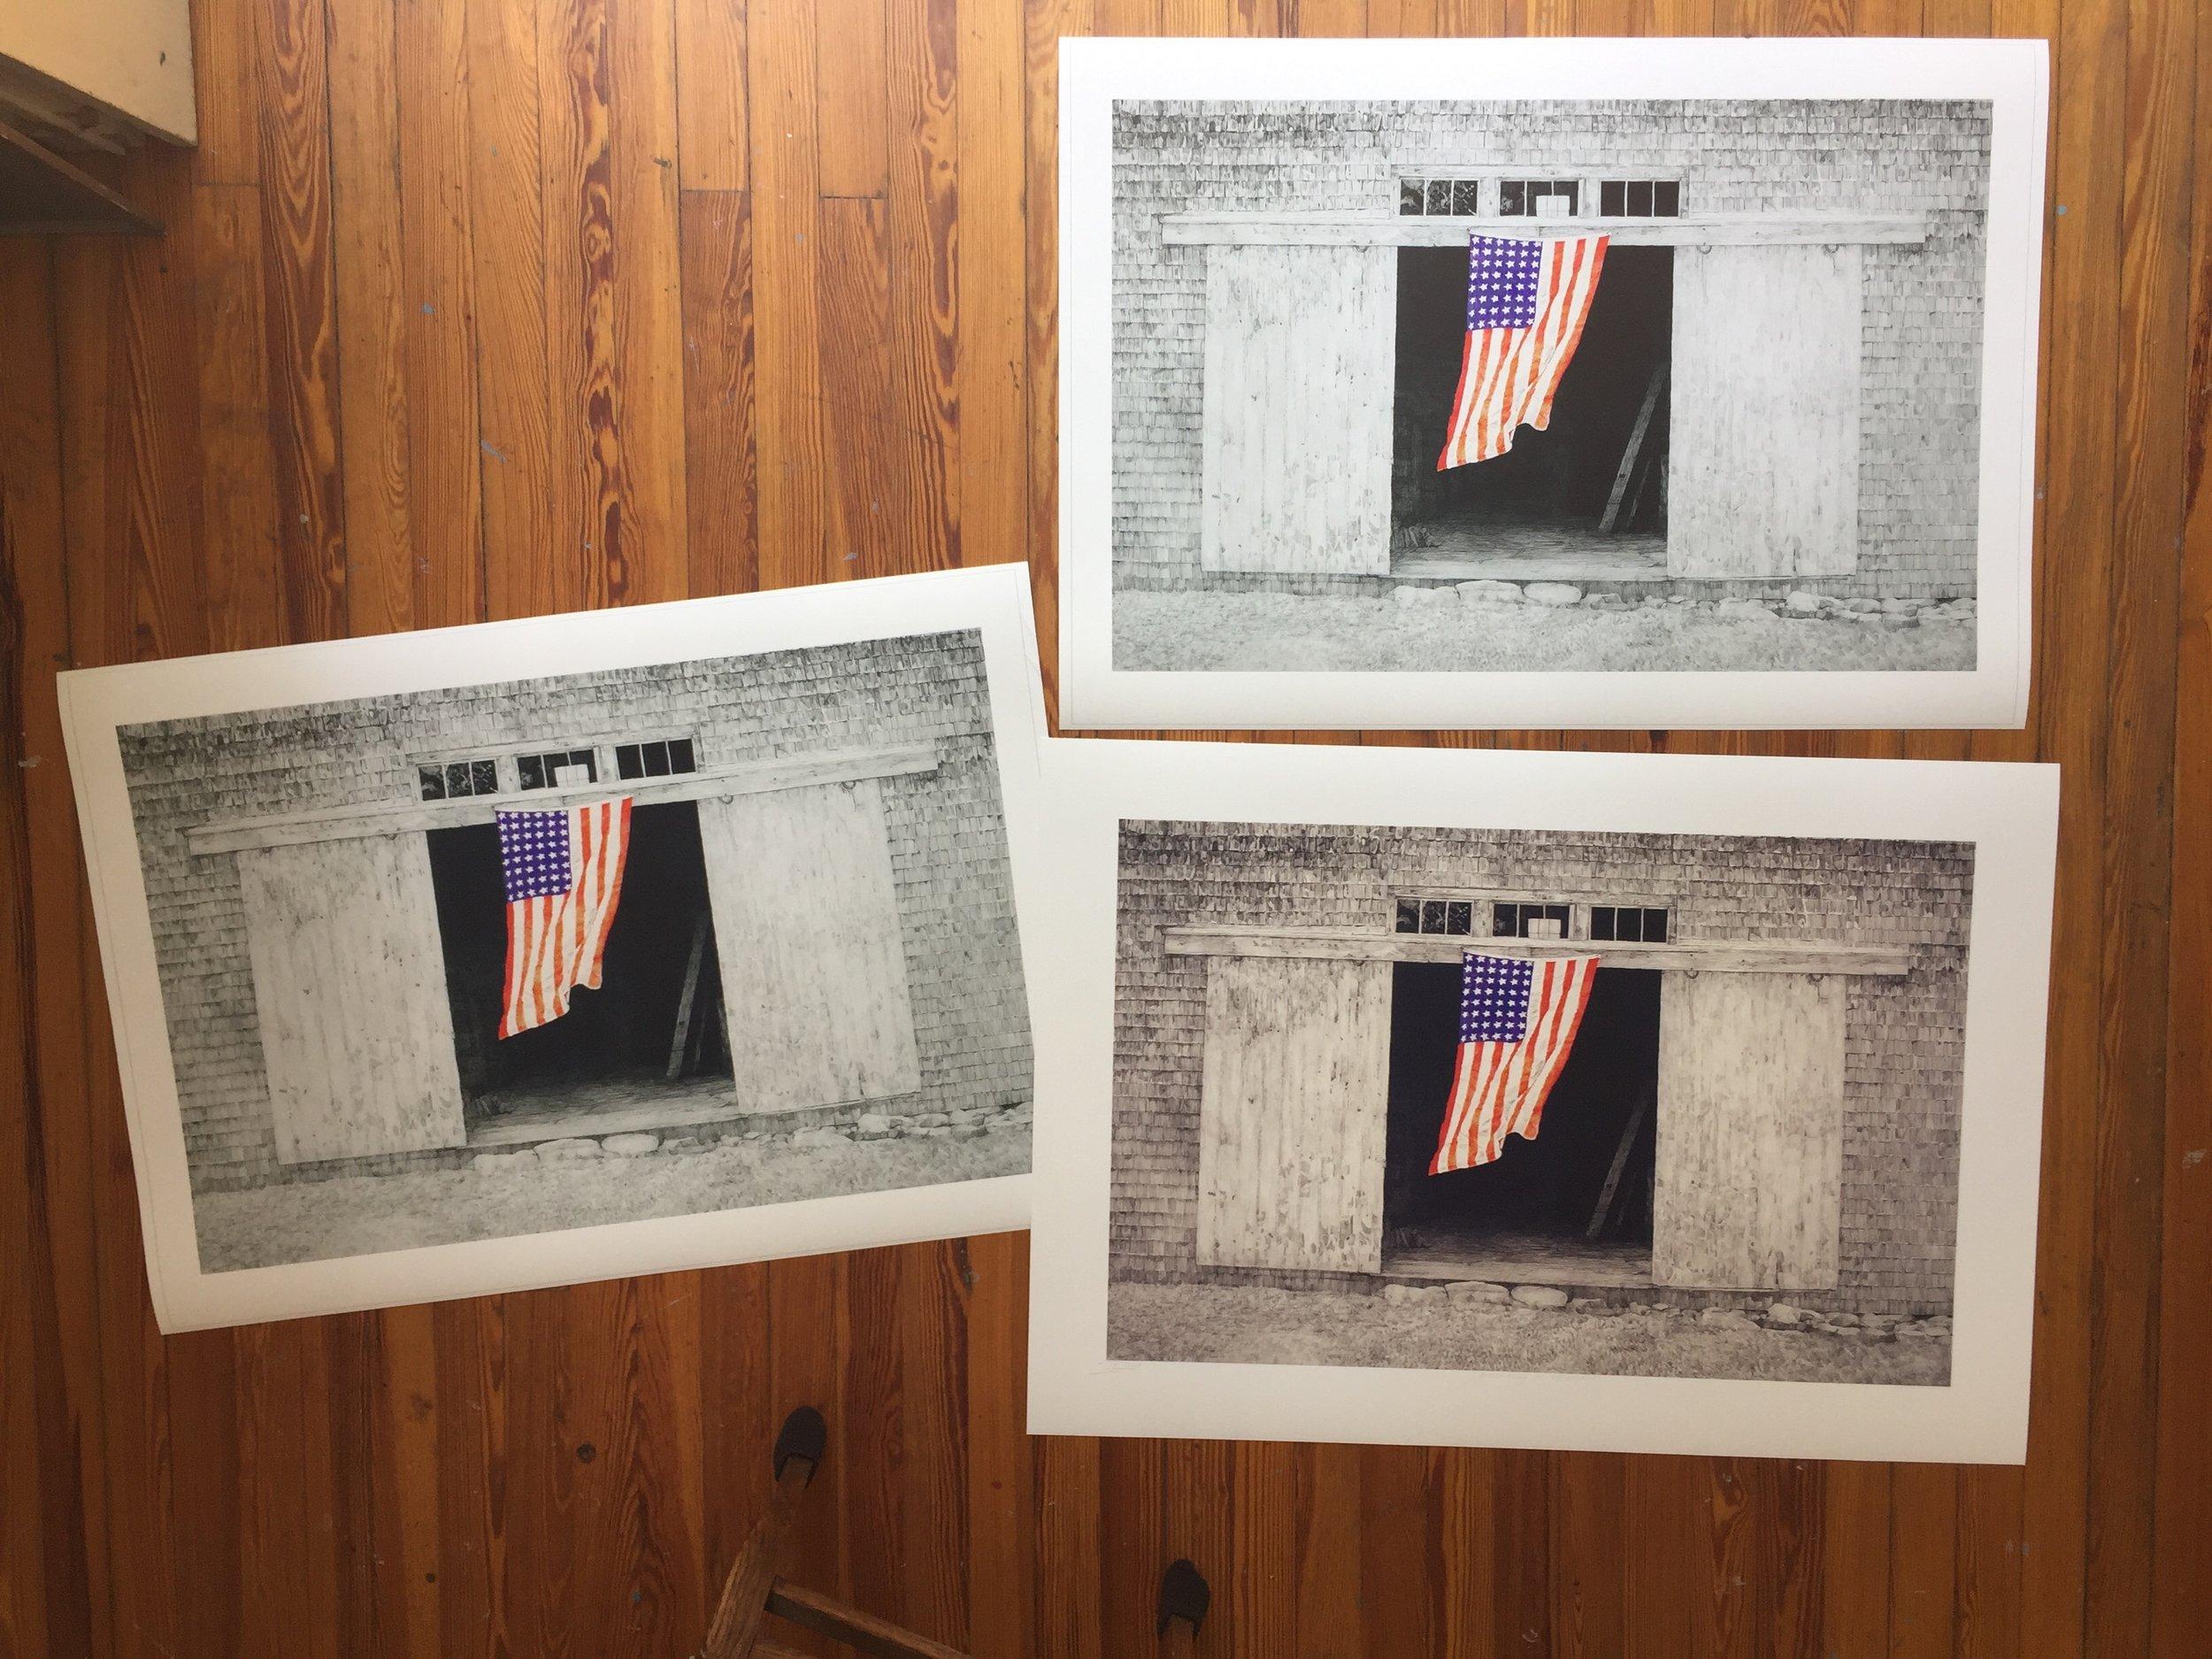 Proofing prints